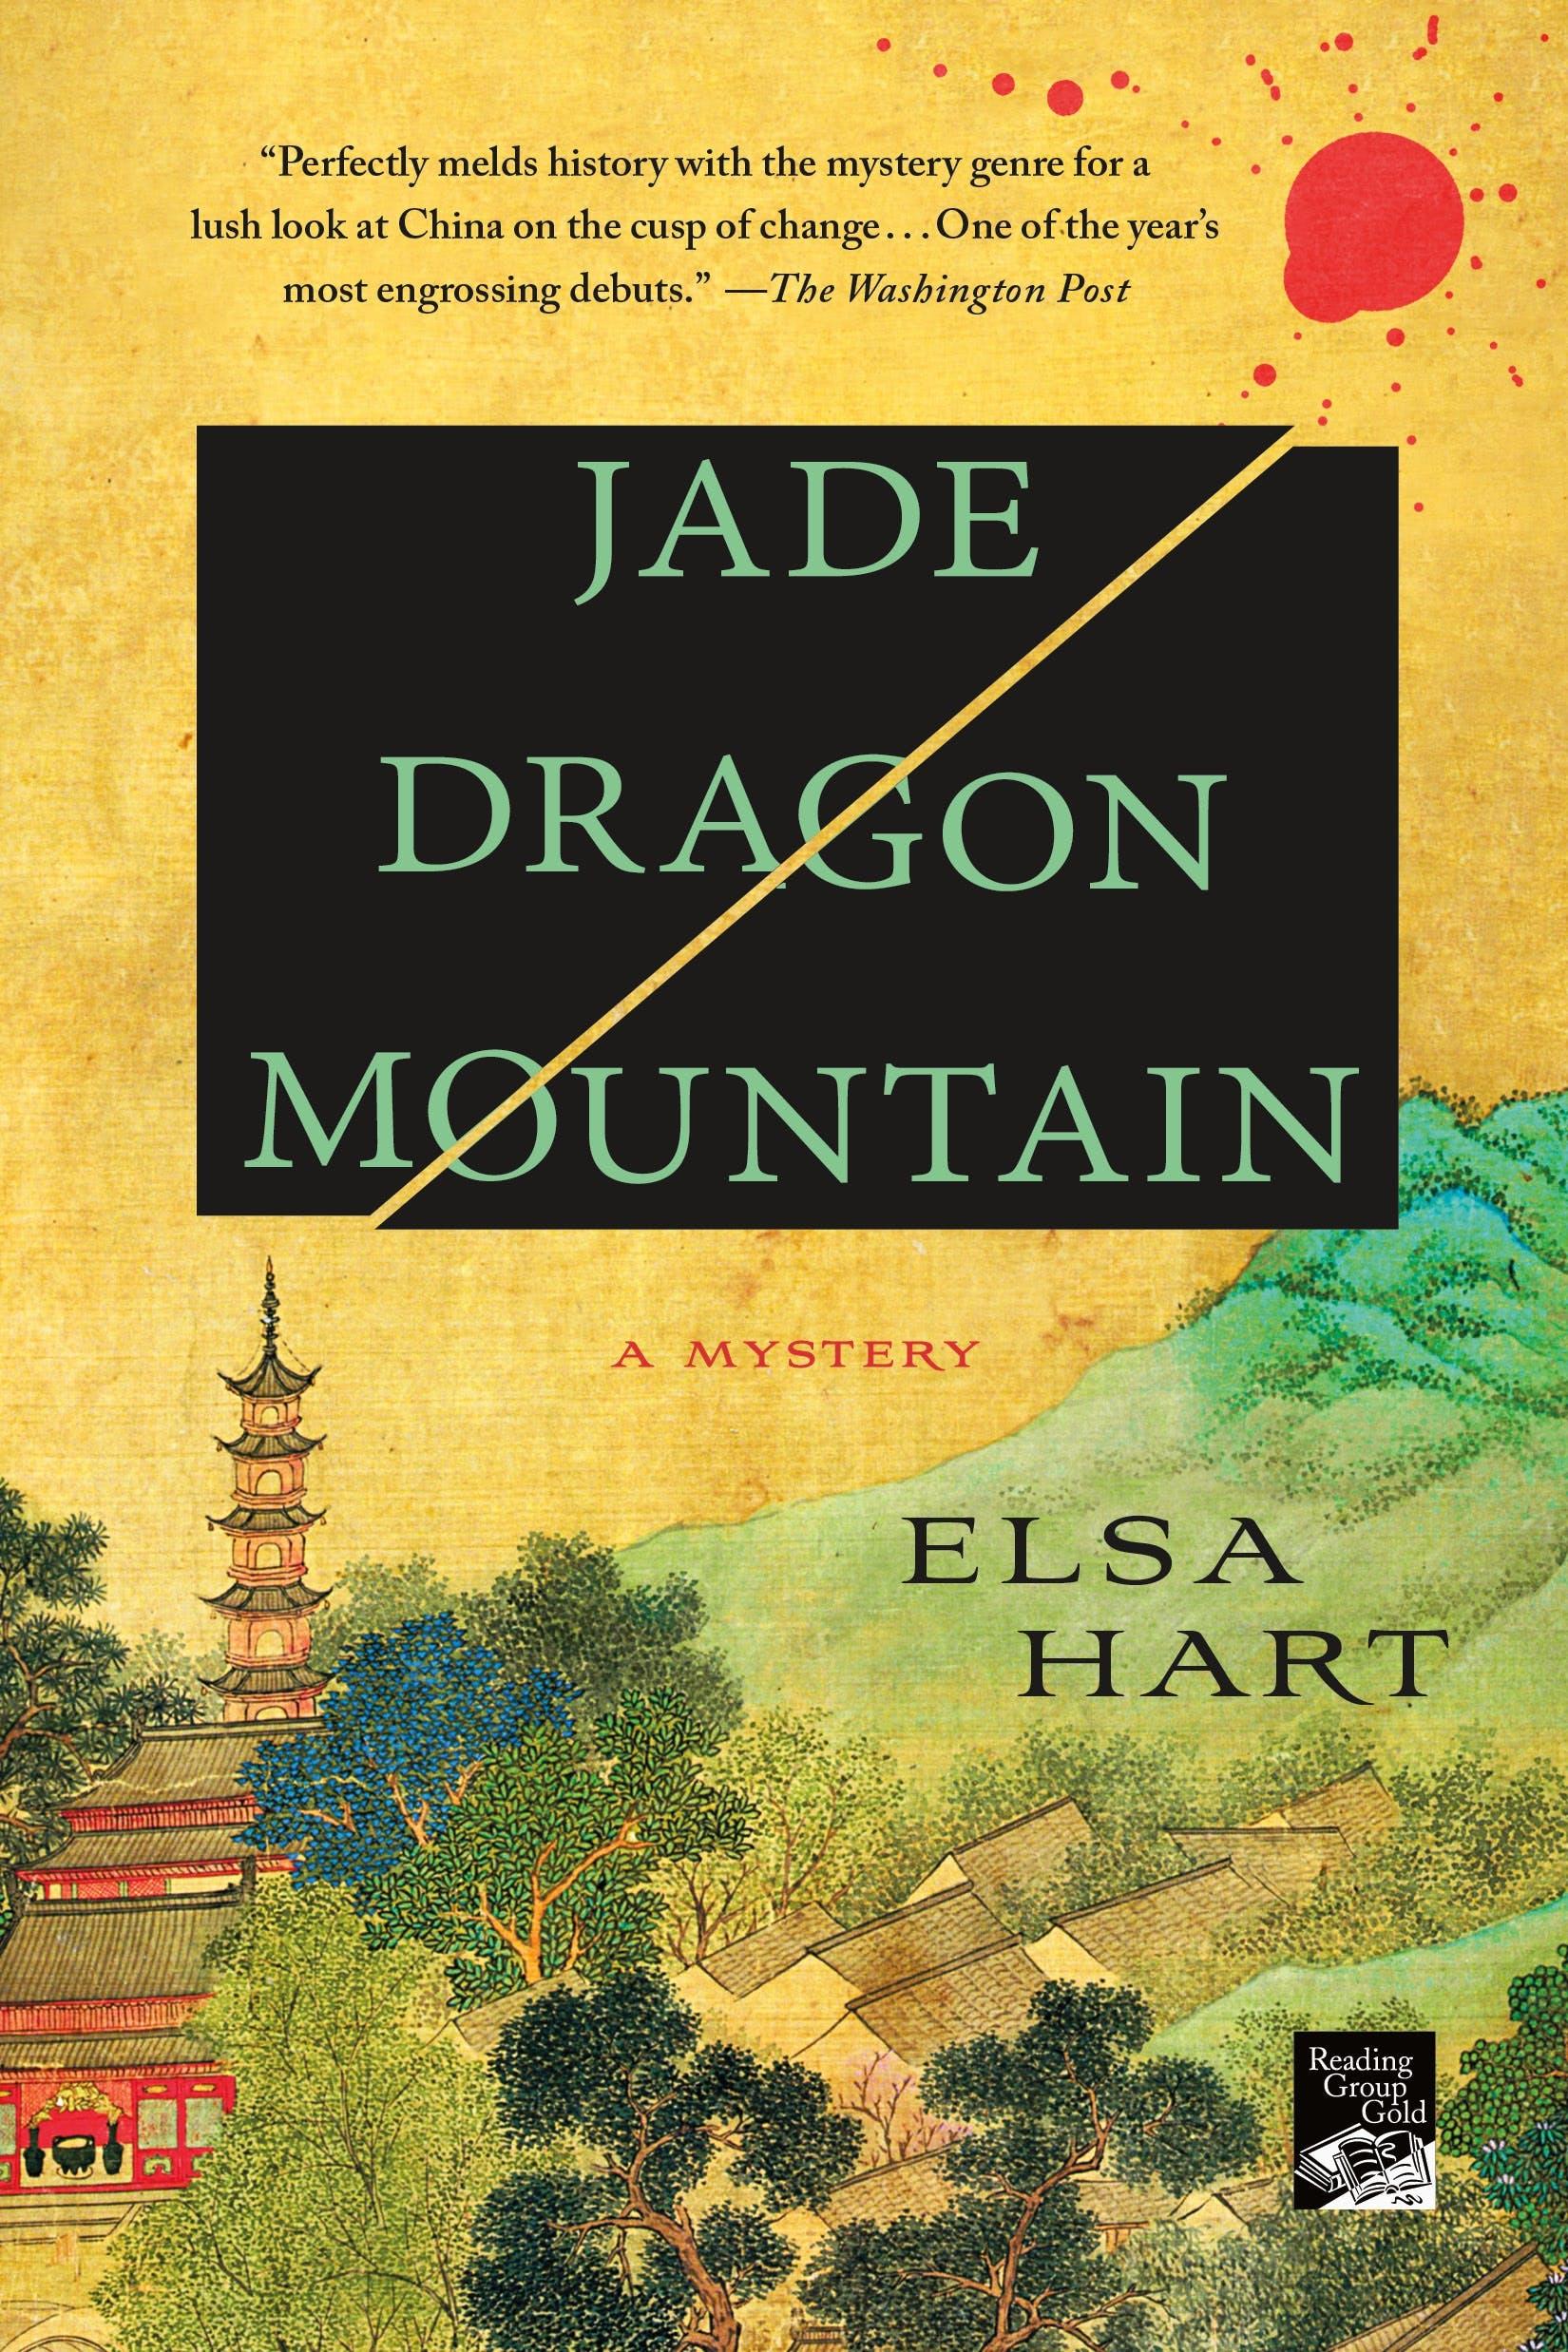 Image of Jade Dragon Mountain